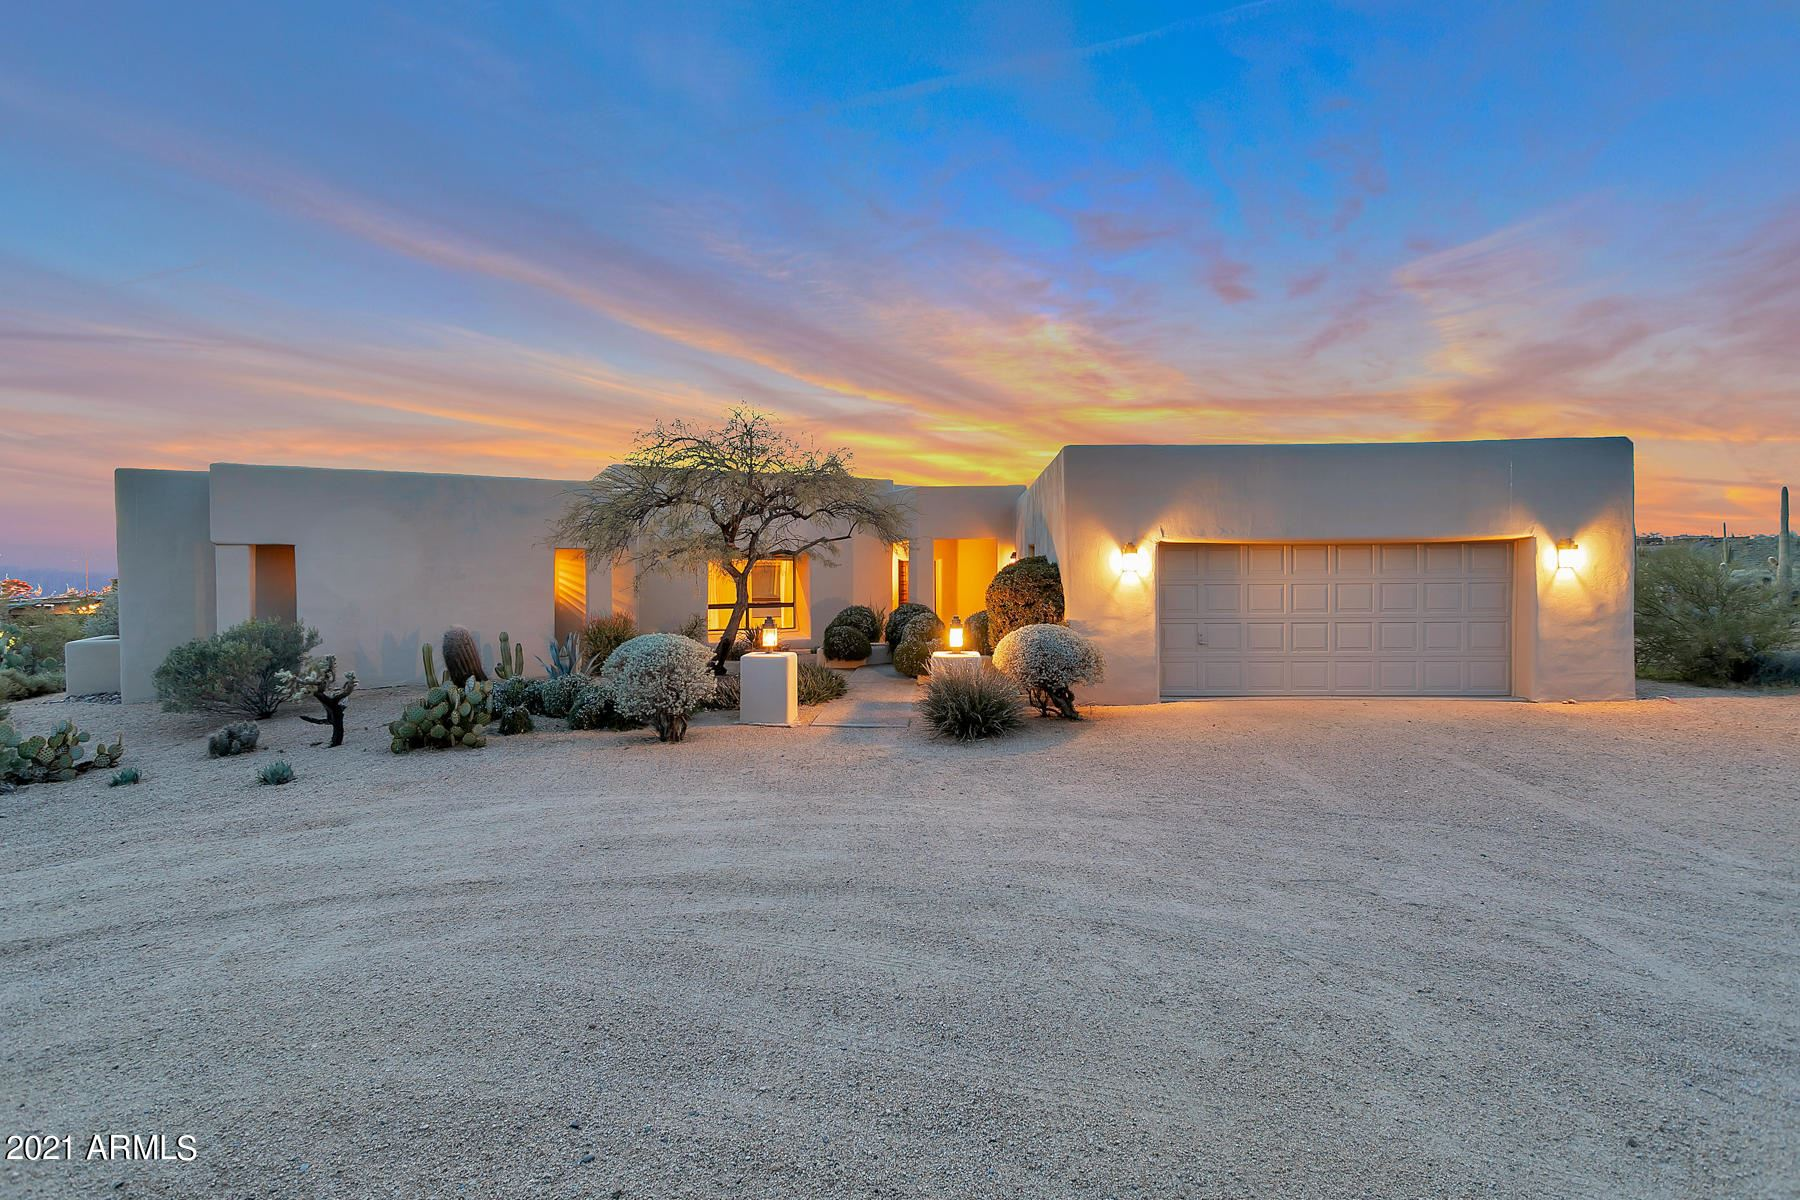 Photo of 37642 N PIMA Road, Carefree, AZ 85377 (MLS # 6195015)